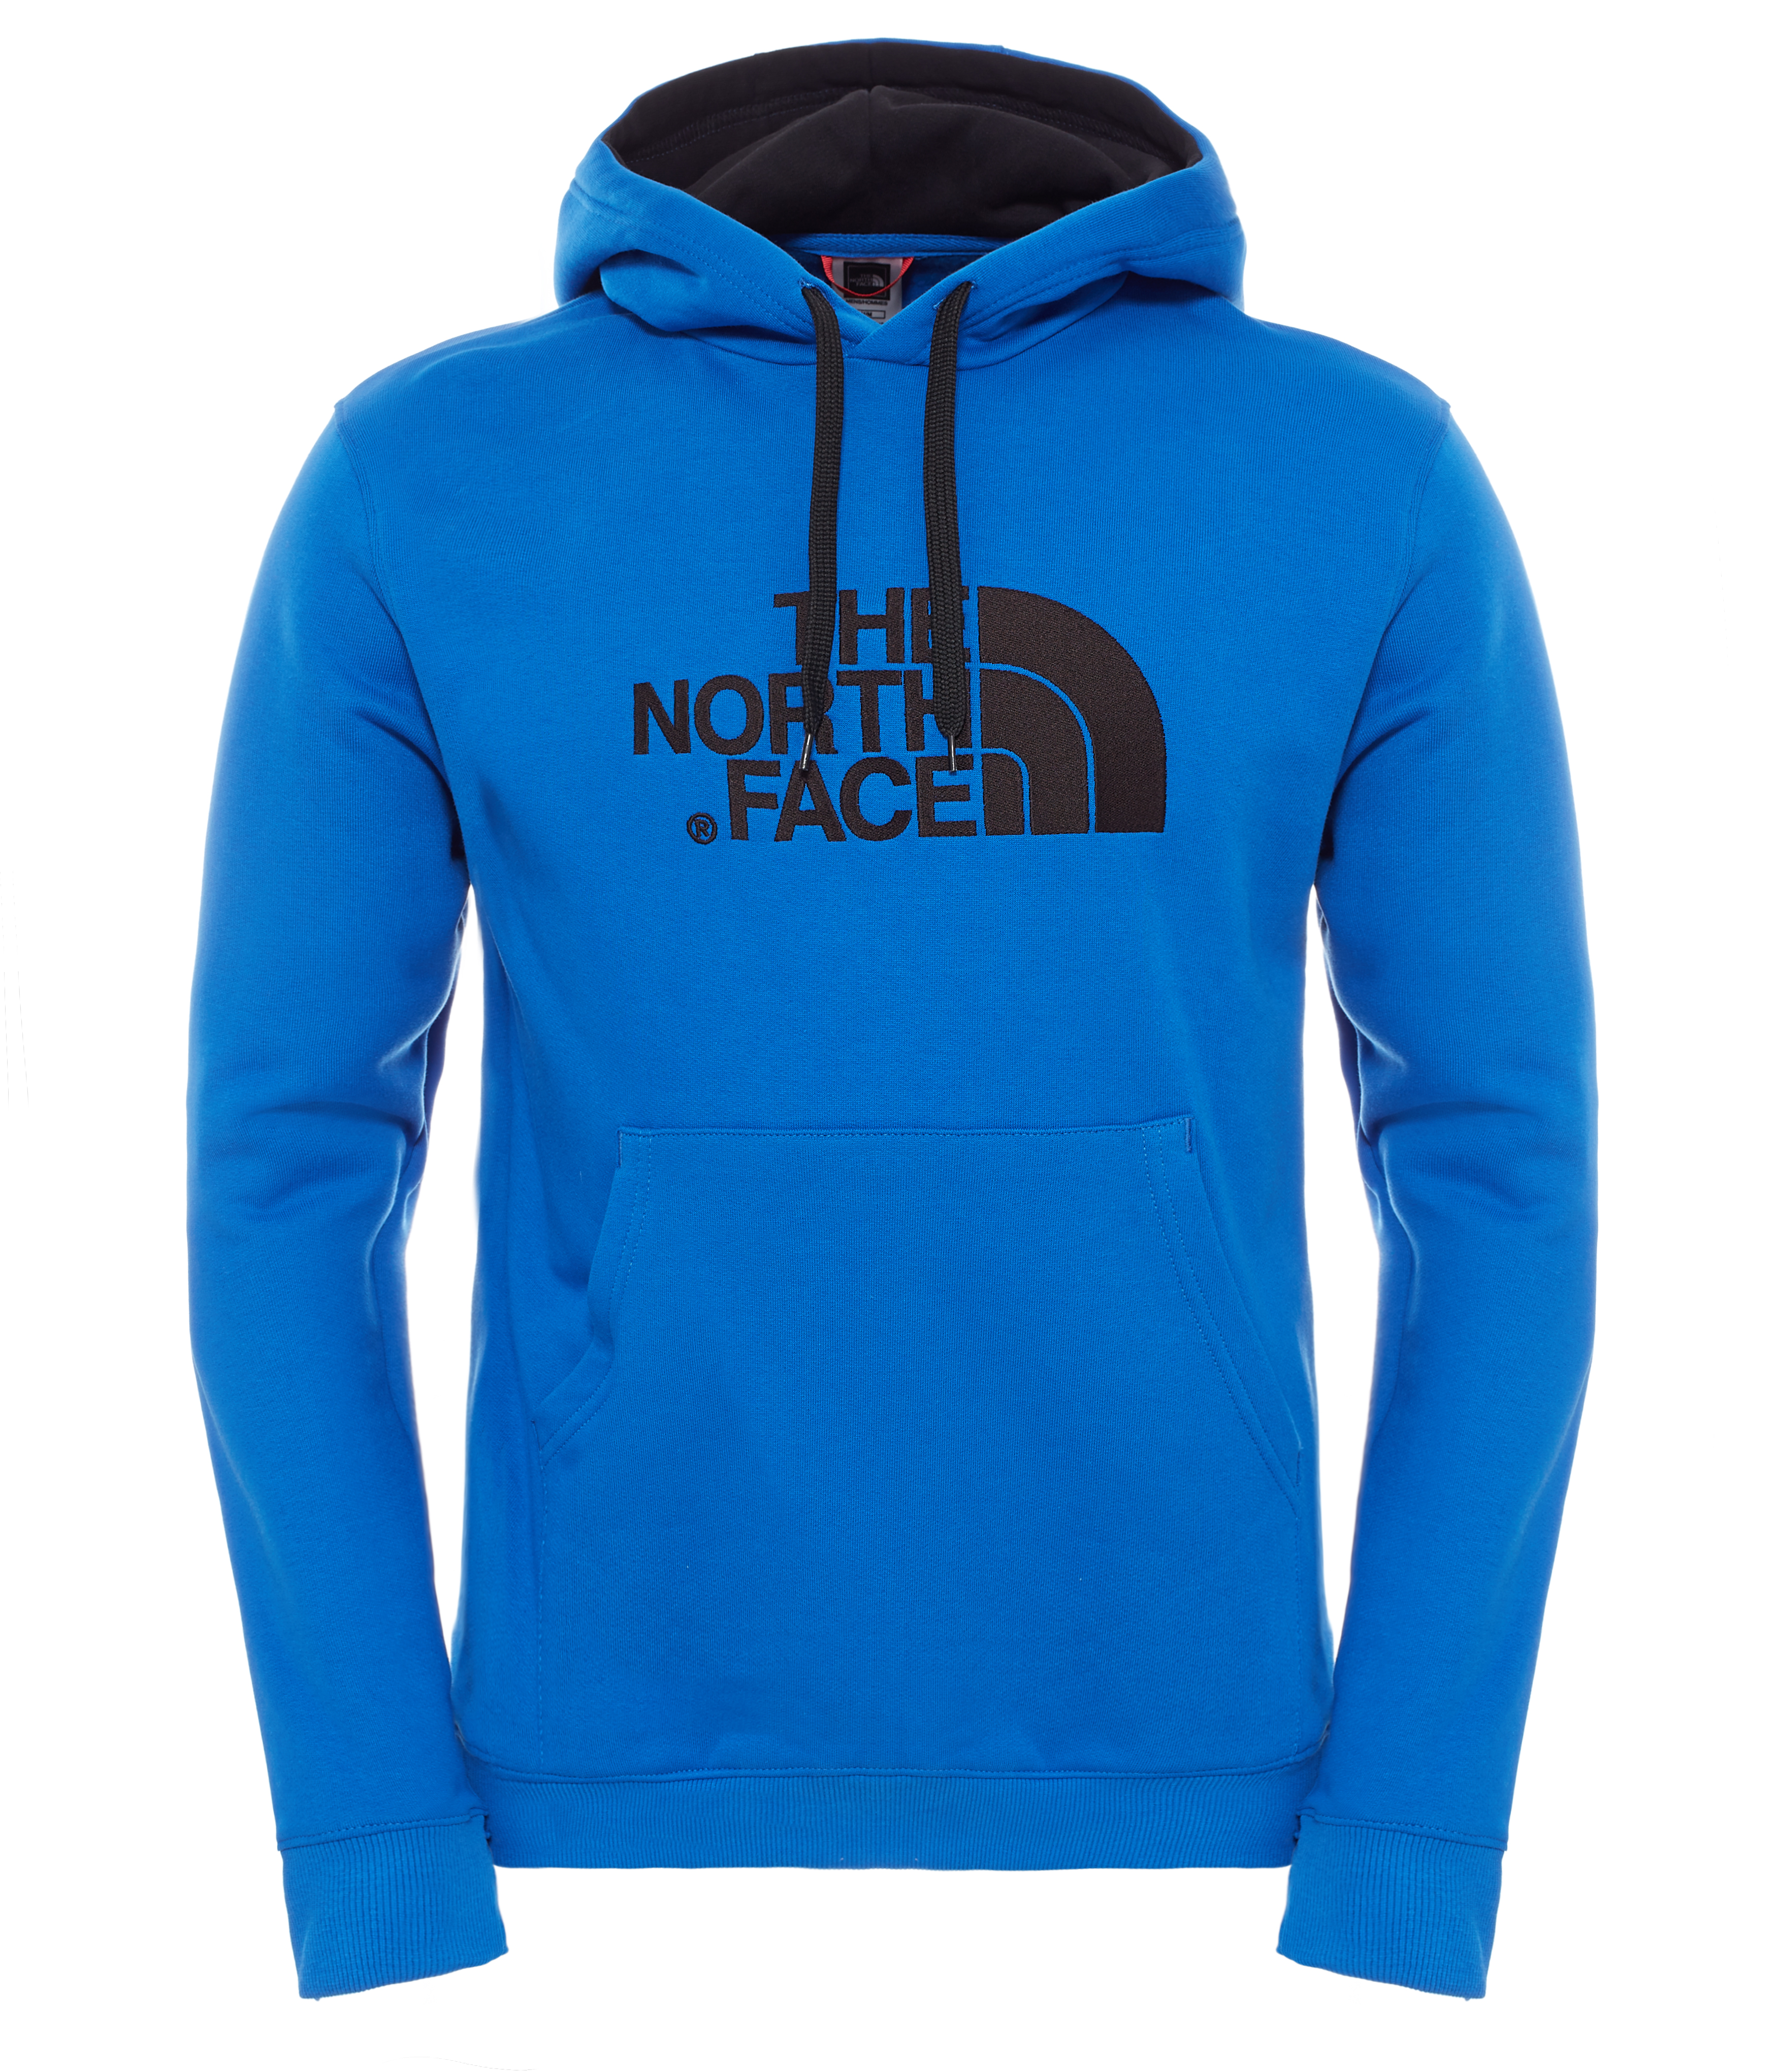 the north face drew peak pullover hoodie pulls sweats epictv shop. Black Bedroom Furniture Sets. Home Design Ideas